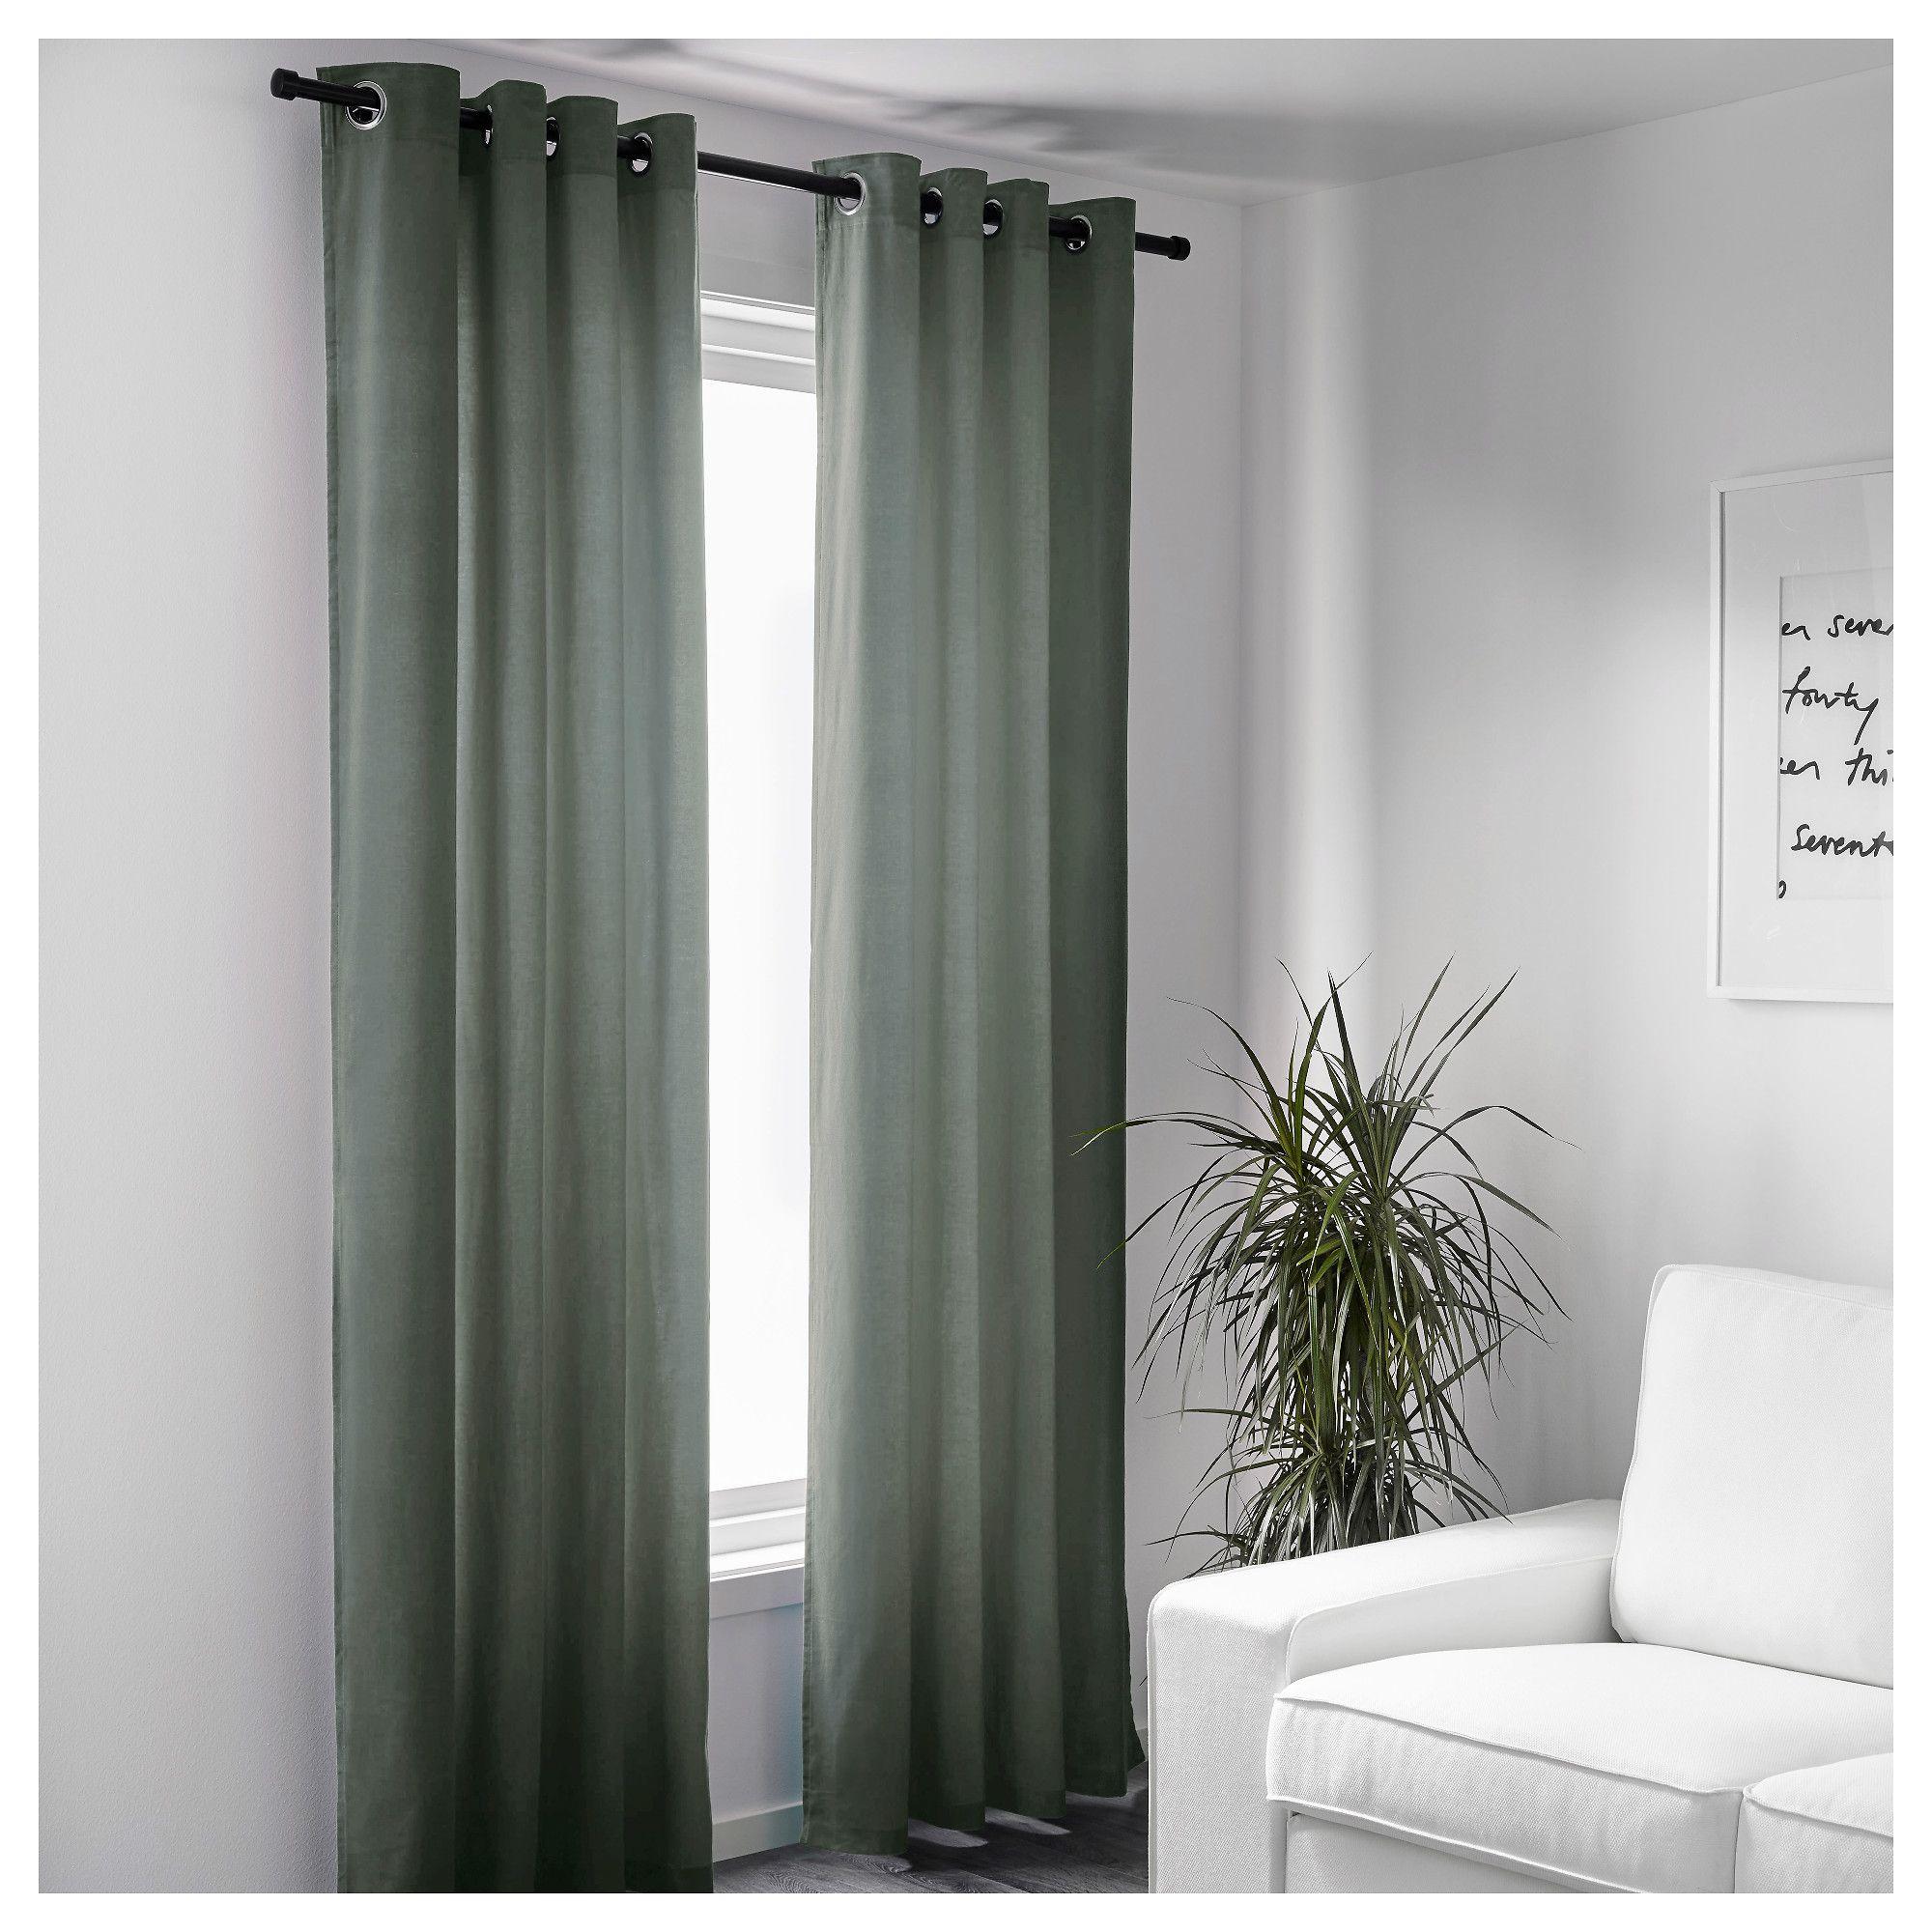 curtains white green and surprising decor design ideas ingenious